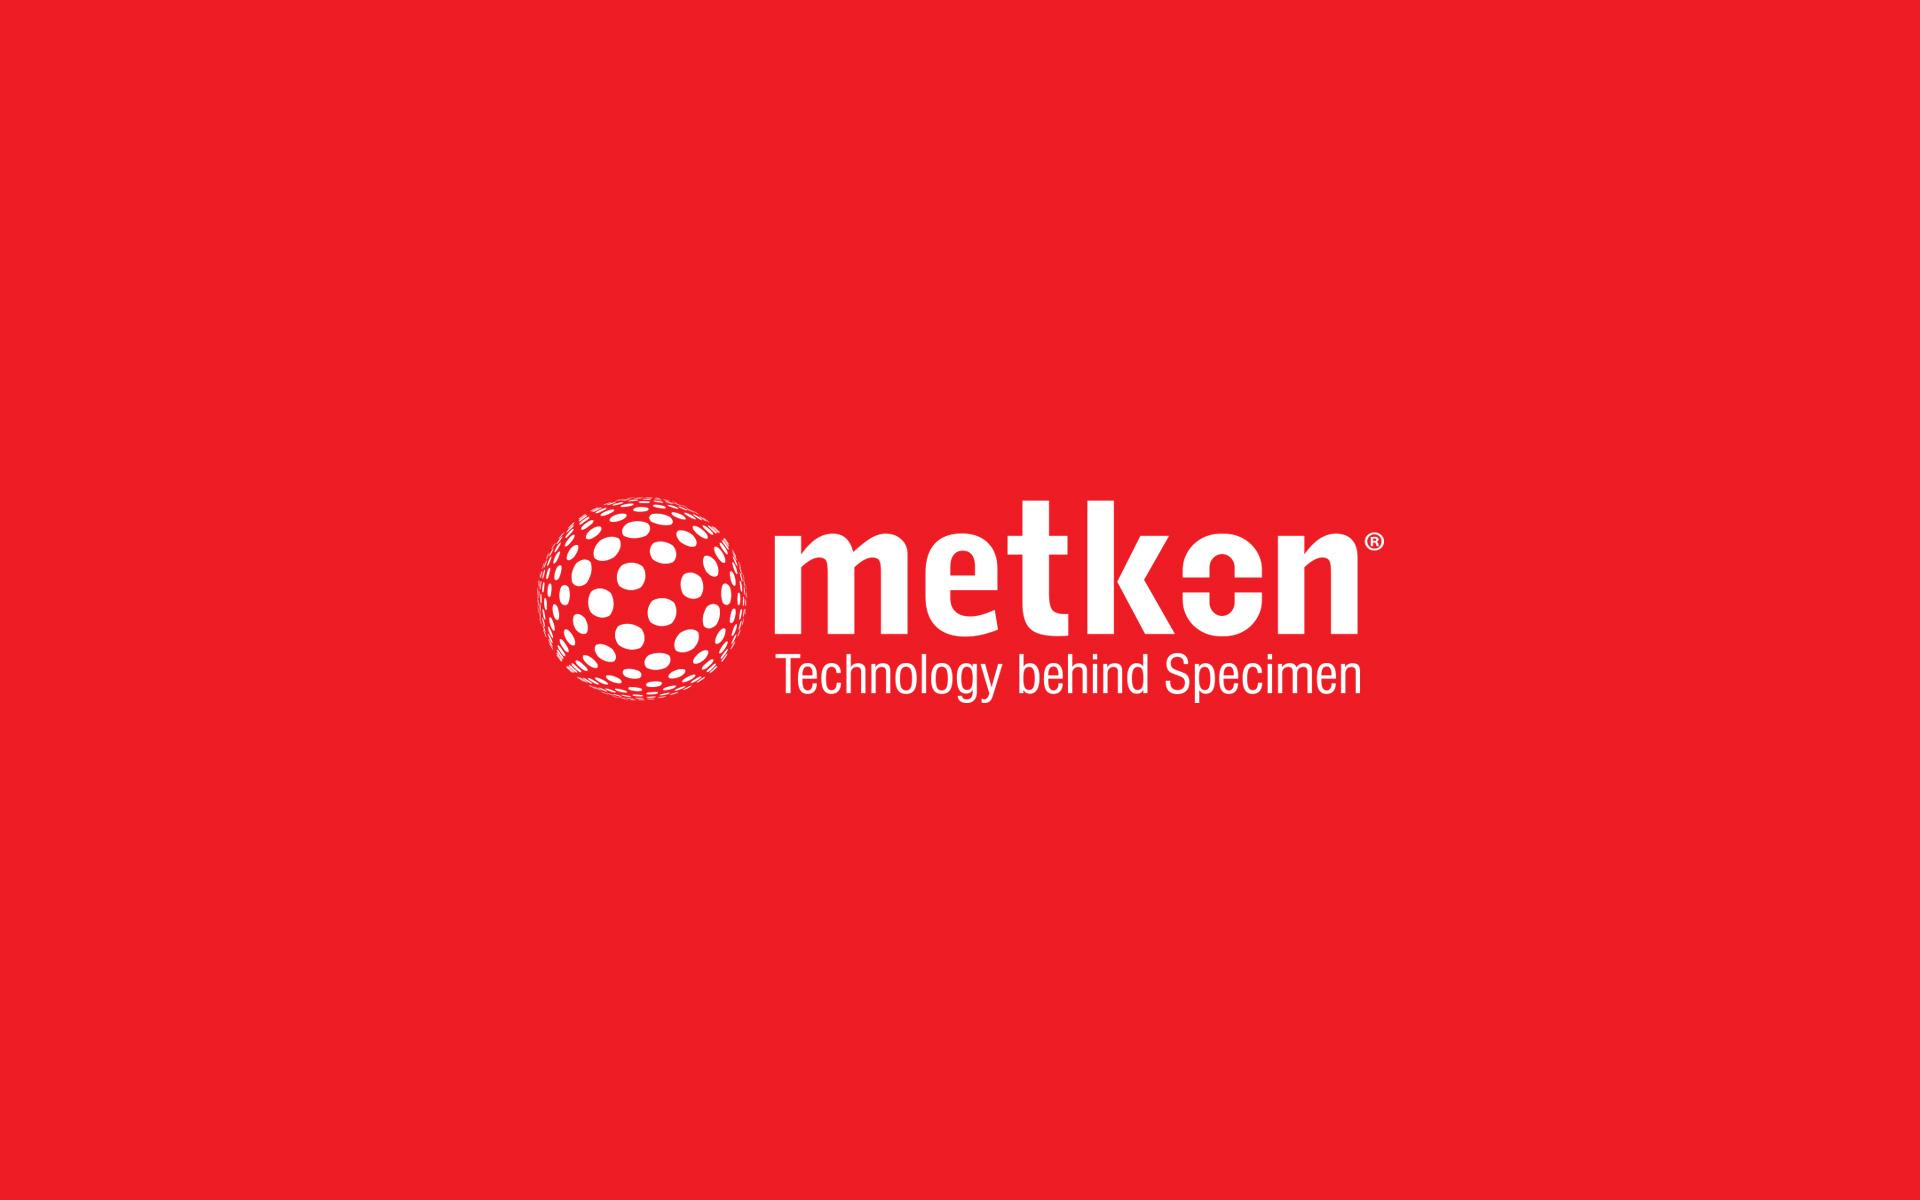 metkon02